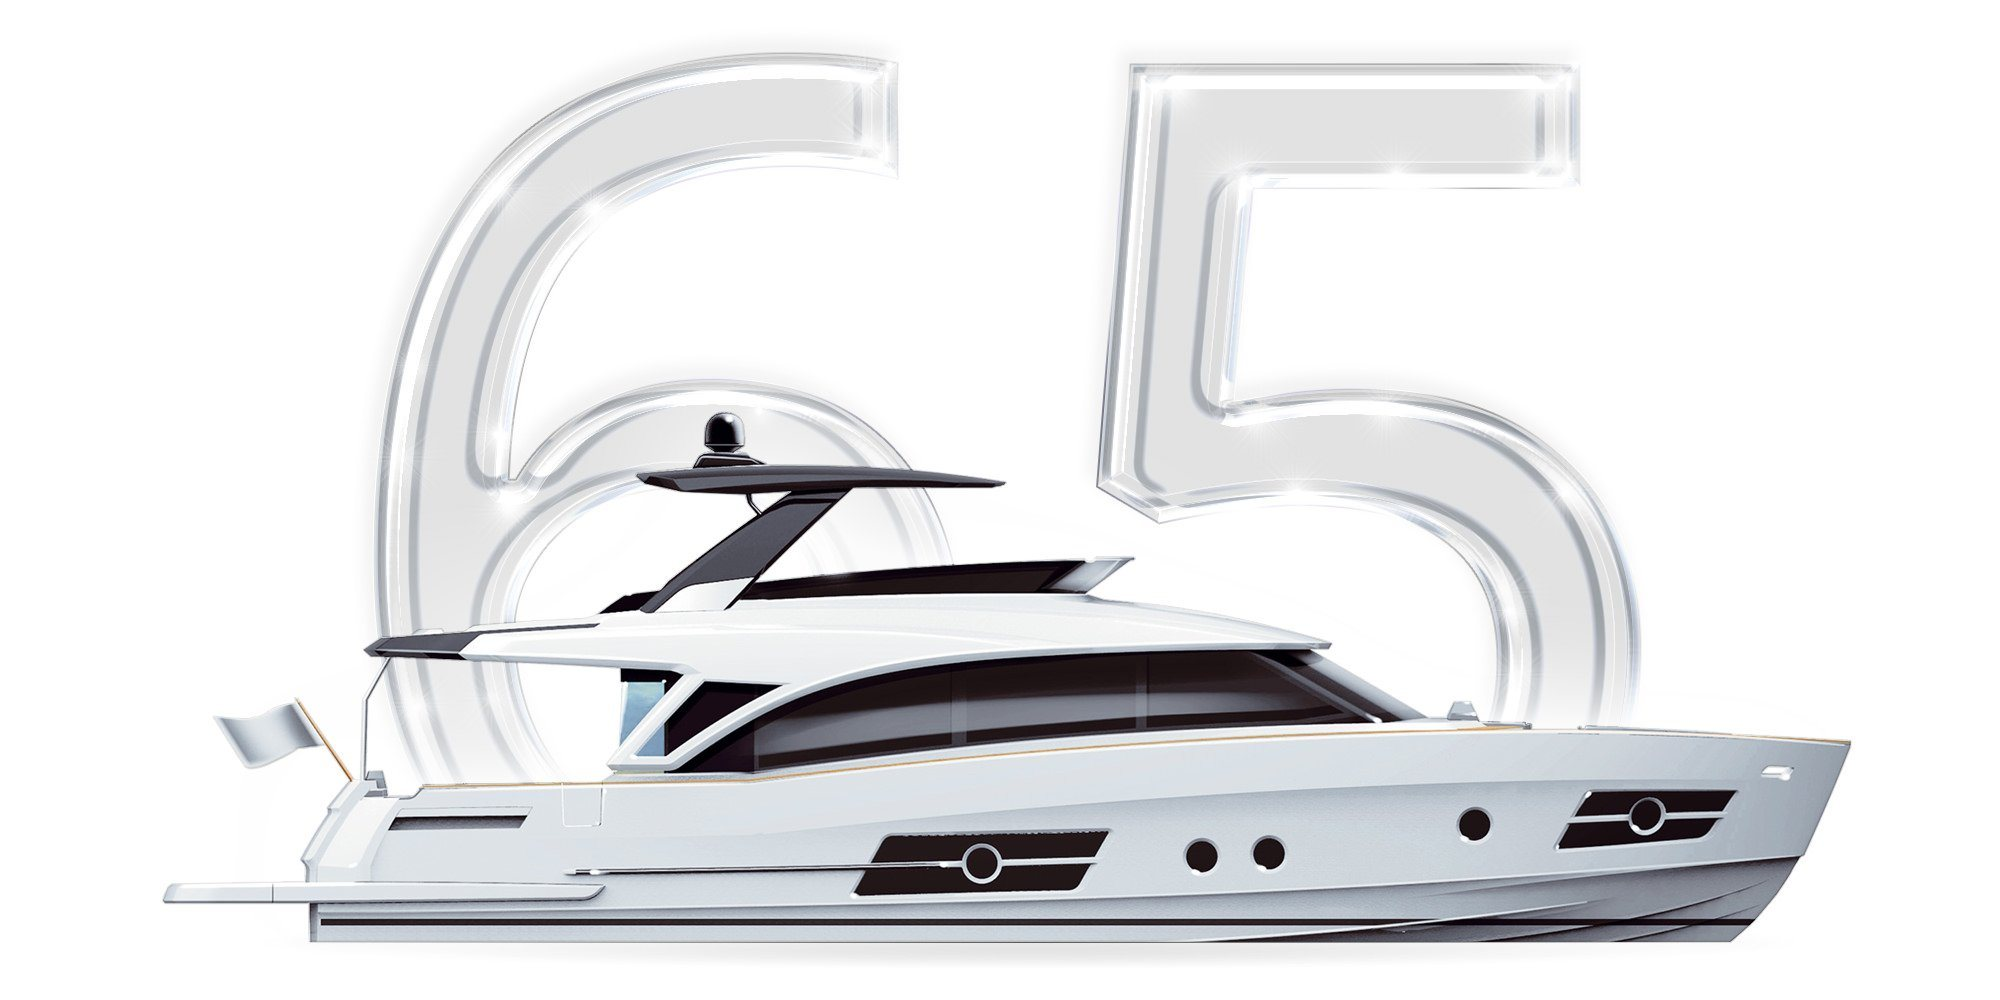 Greenline Hybrid - Greenline Yachts